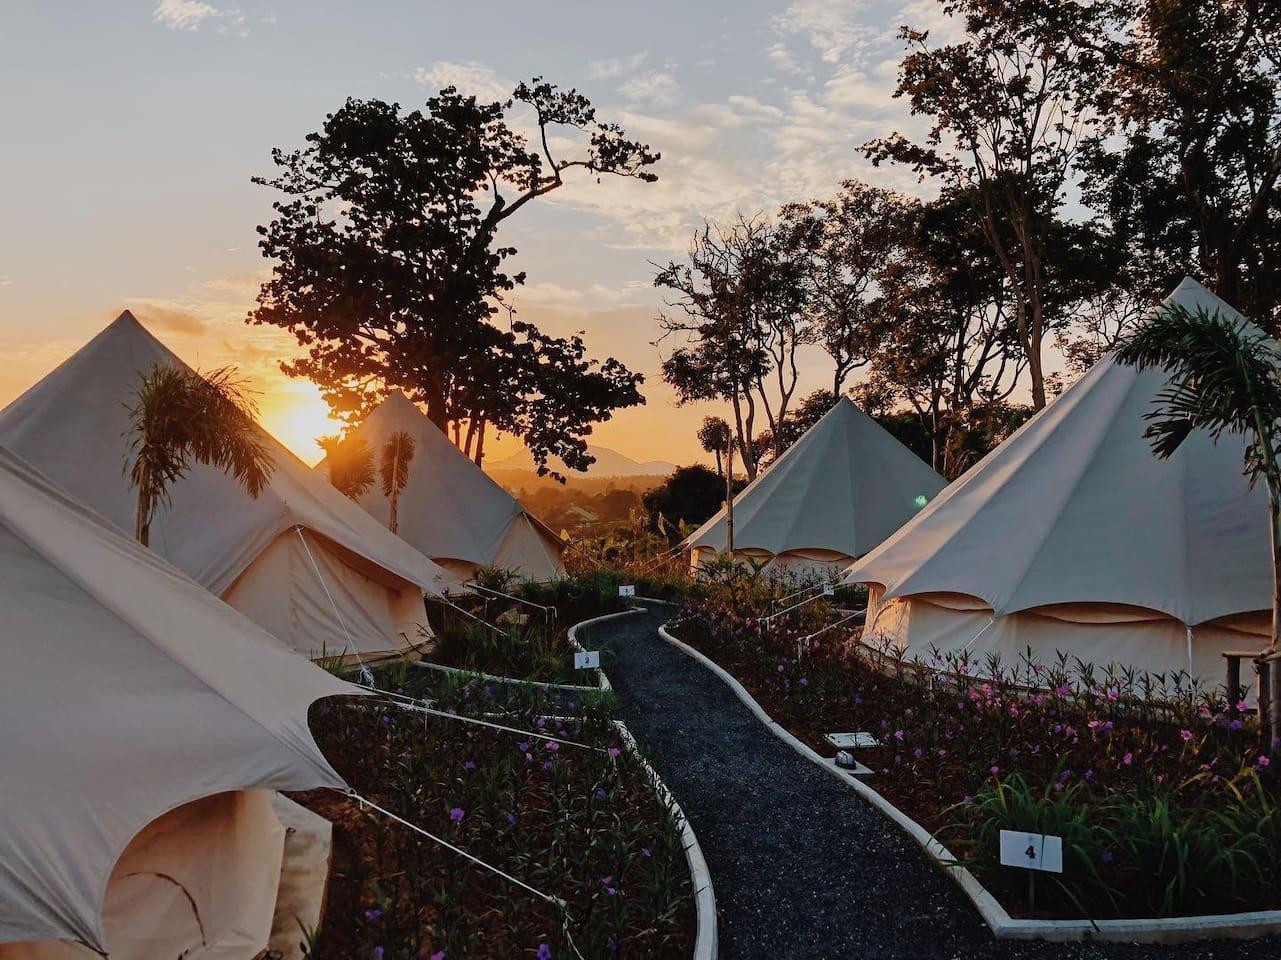 Tropical Garden Tent CAMPING 500m Away From Beach